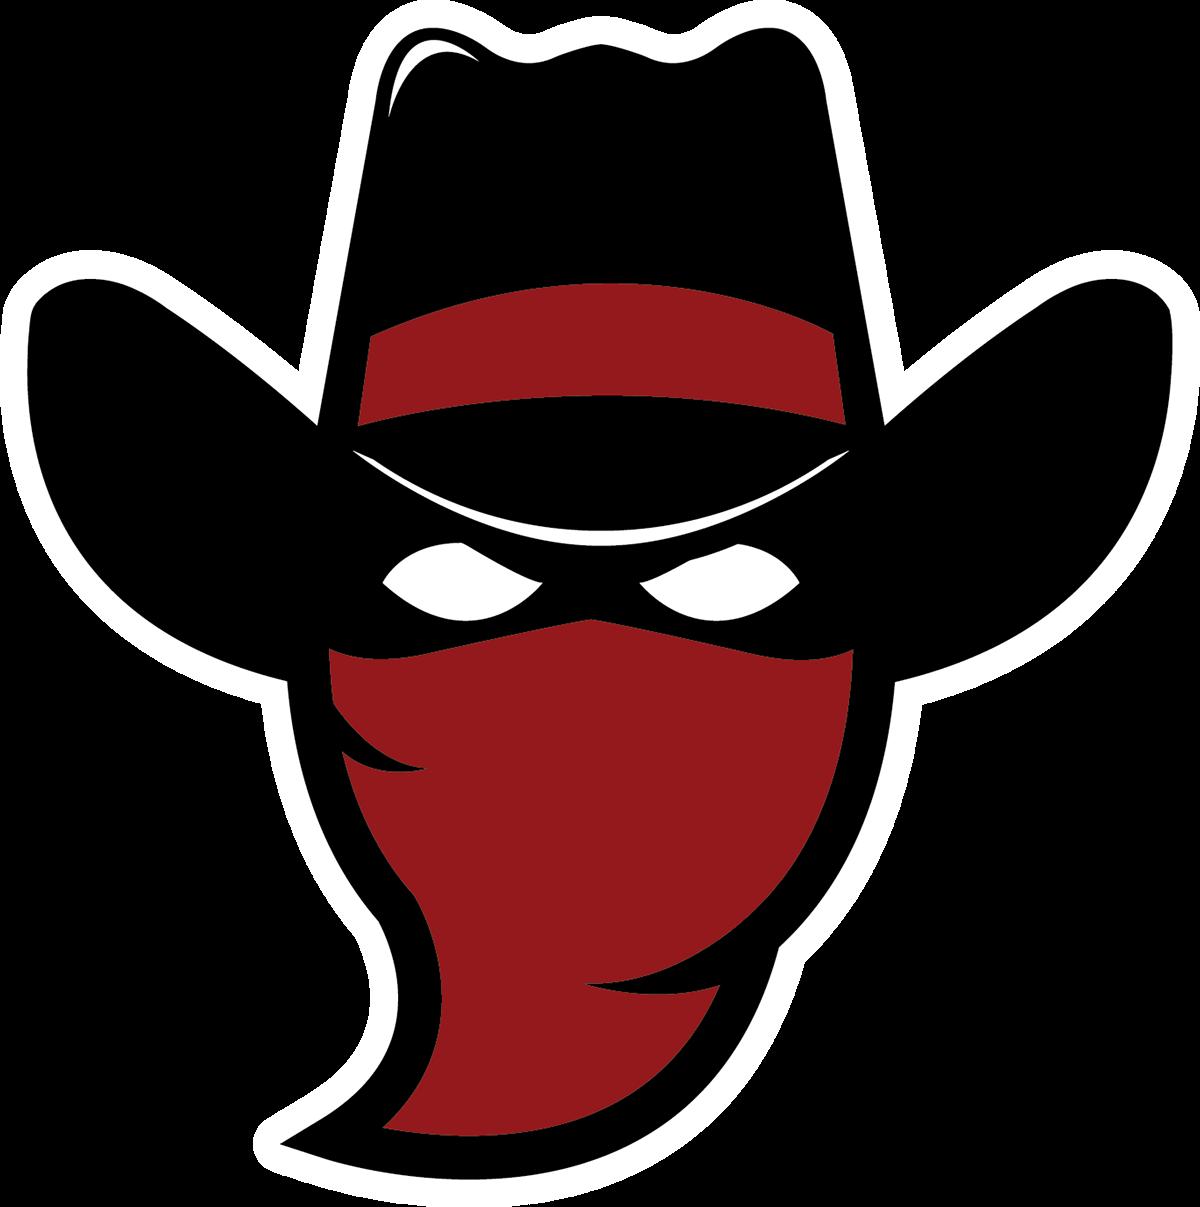 jpg royalty free download Bandits basketball team concept. Cowboys vector bandit